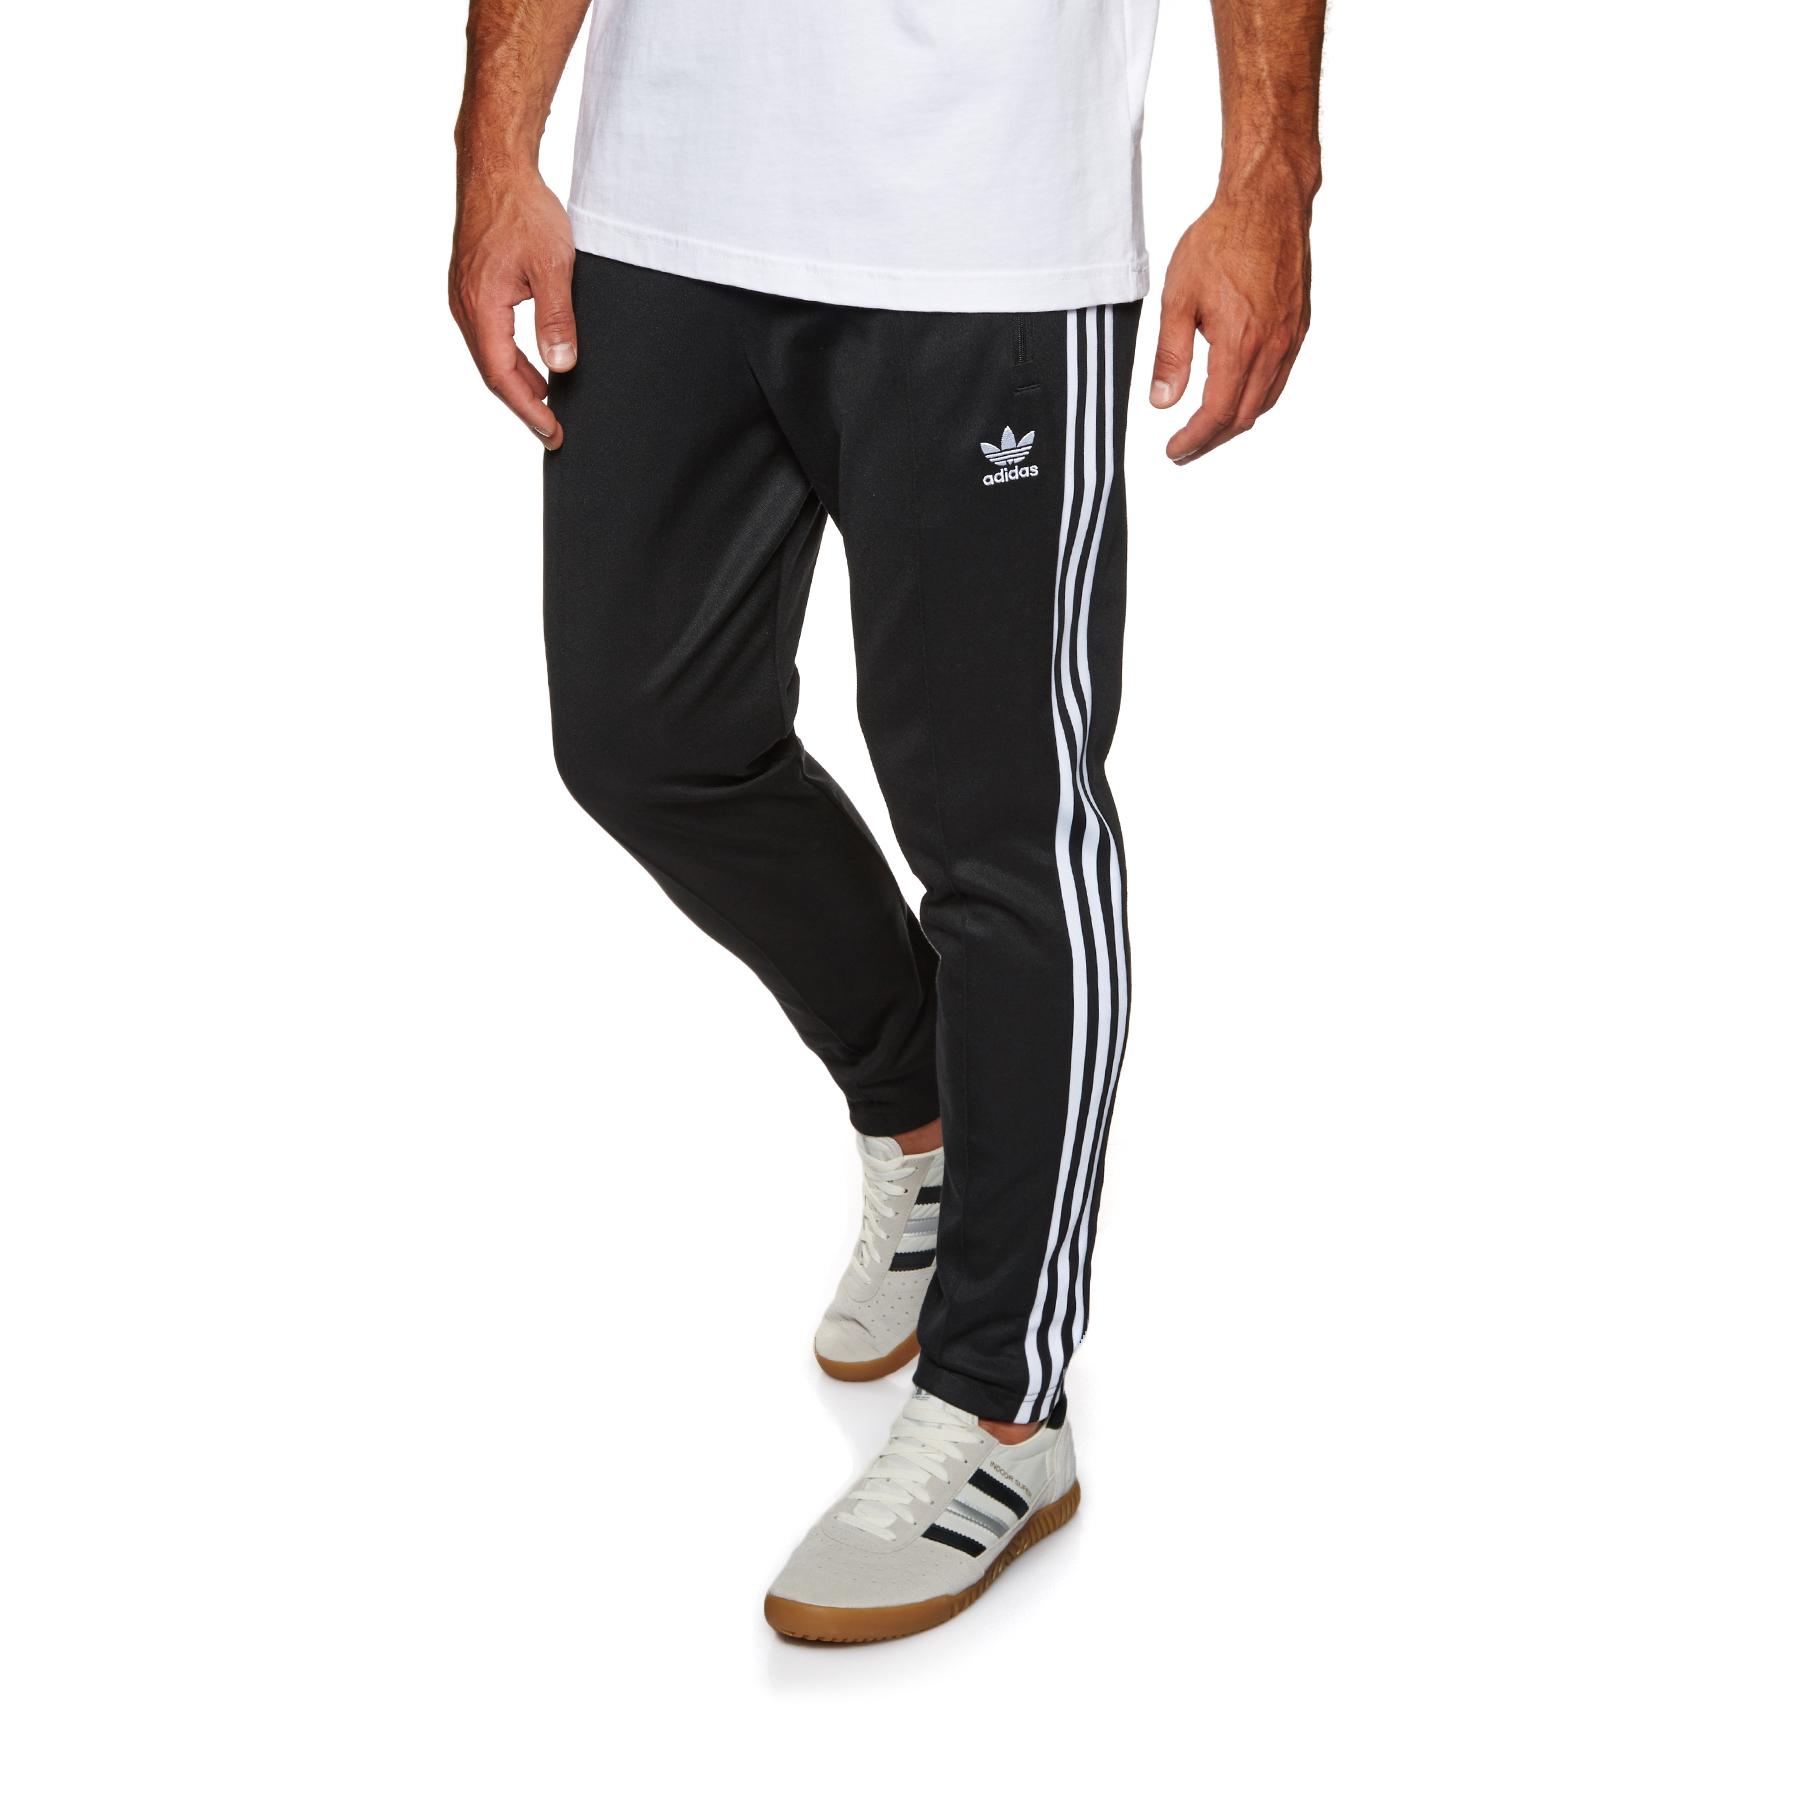 New Seasonal Sales are Here! 48% Off Adidas Originals SST